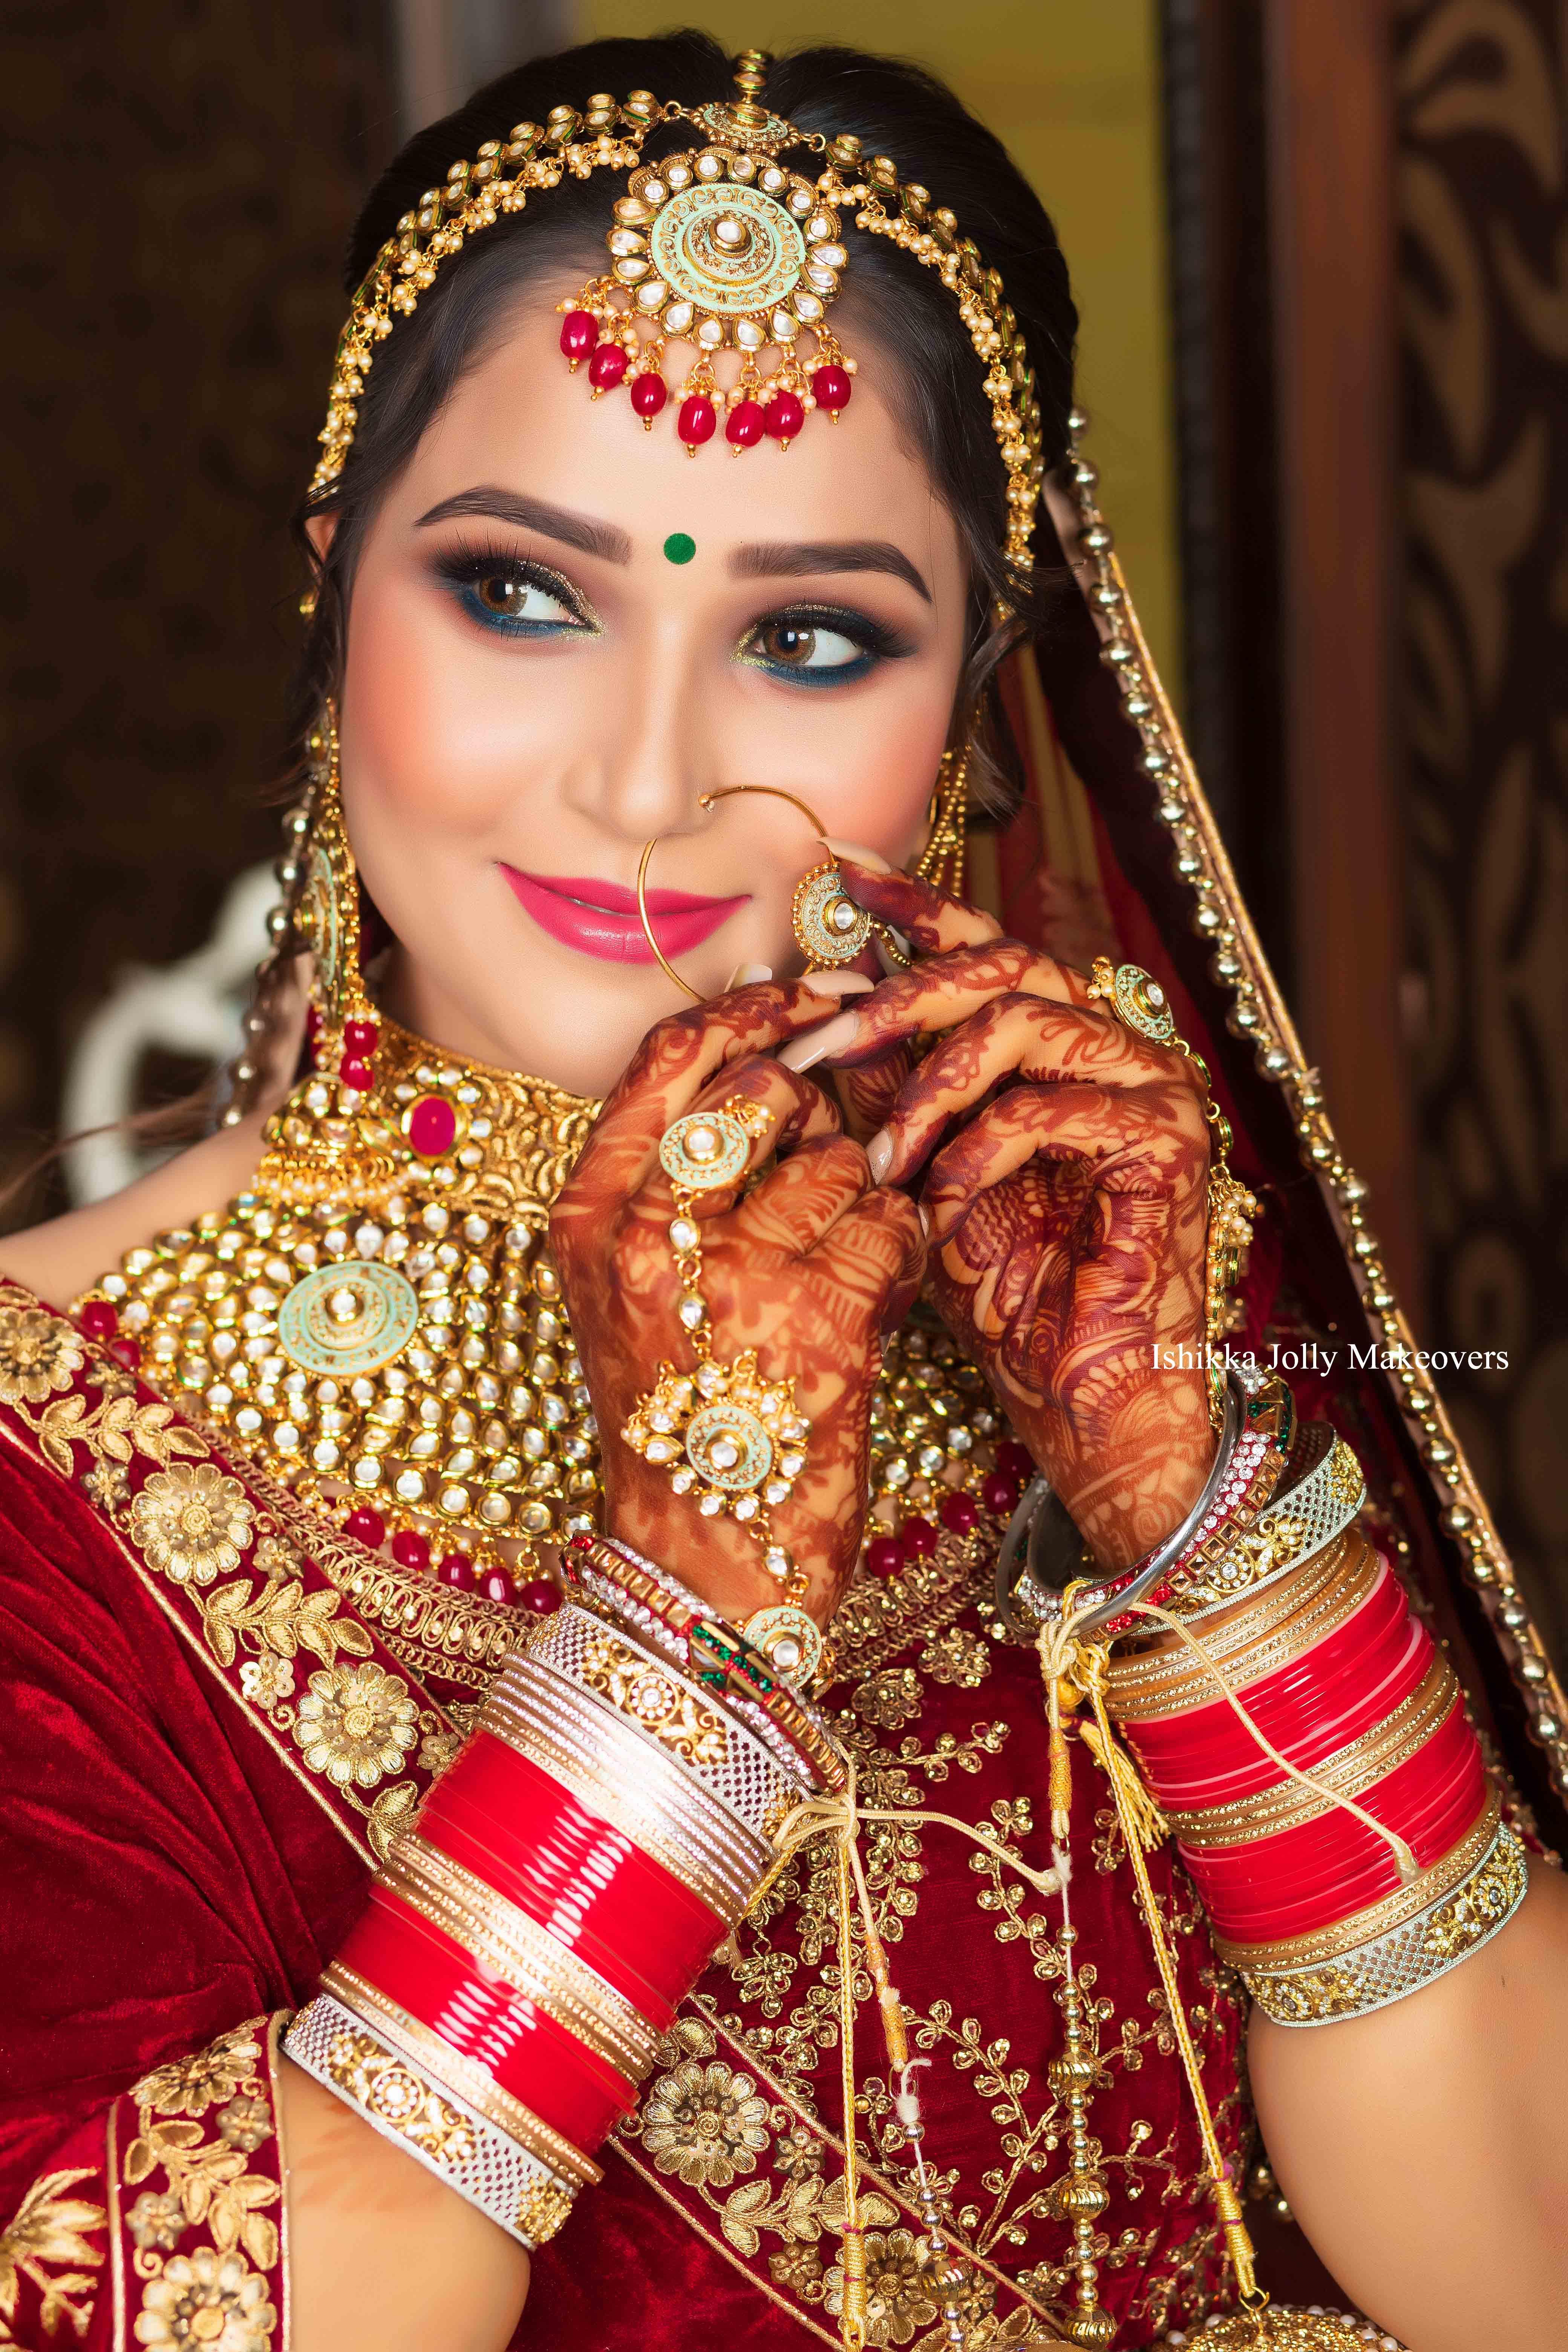 Bridal Makeup Artist in Delhi-NCR, Gurgaon